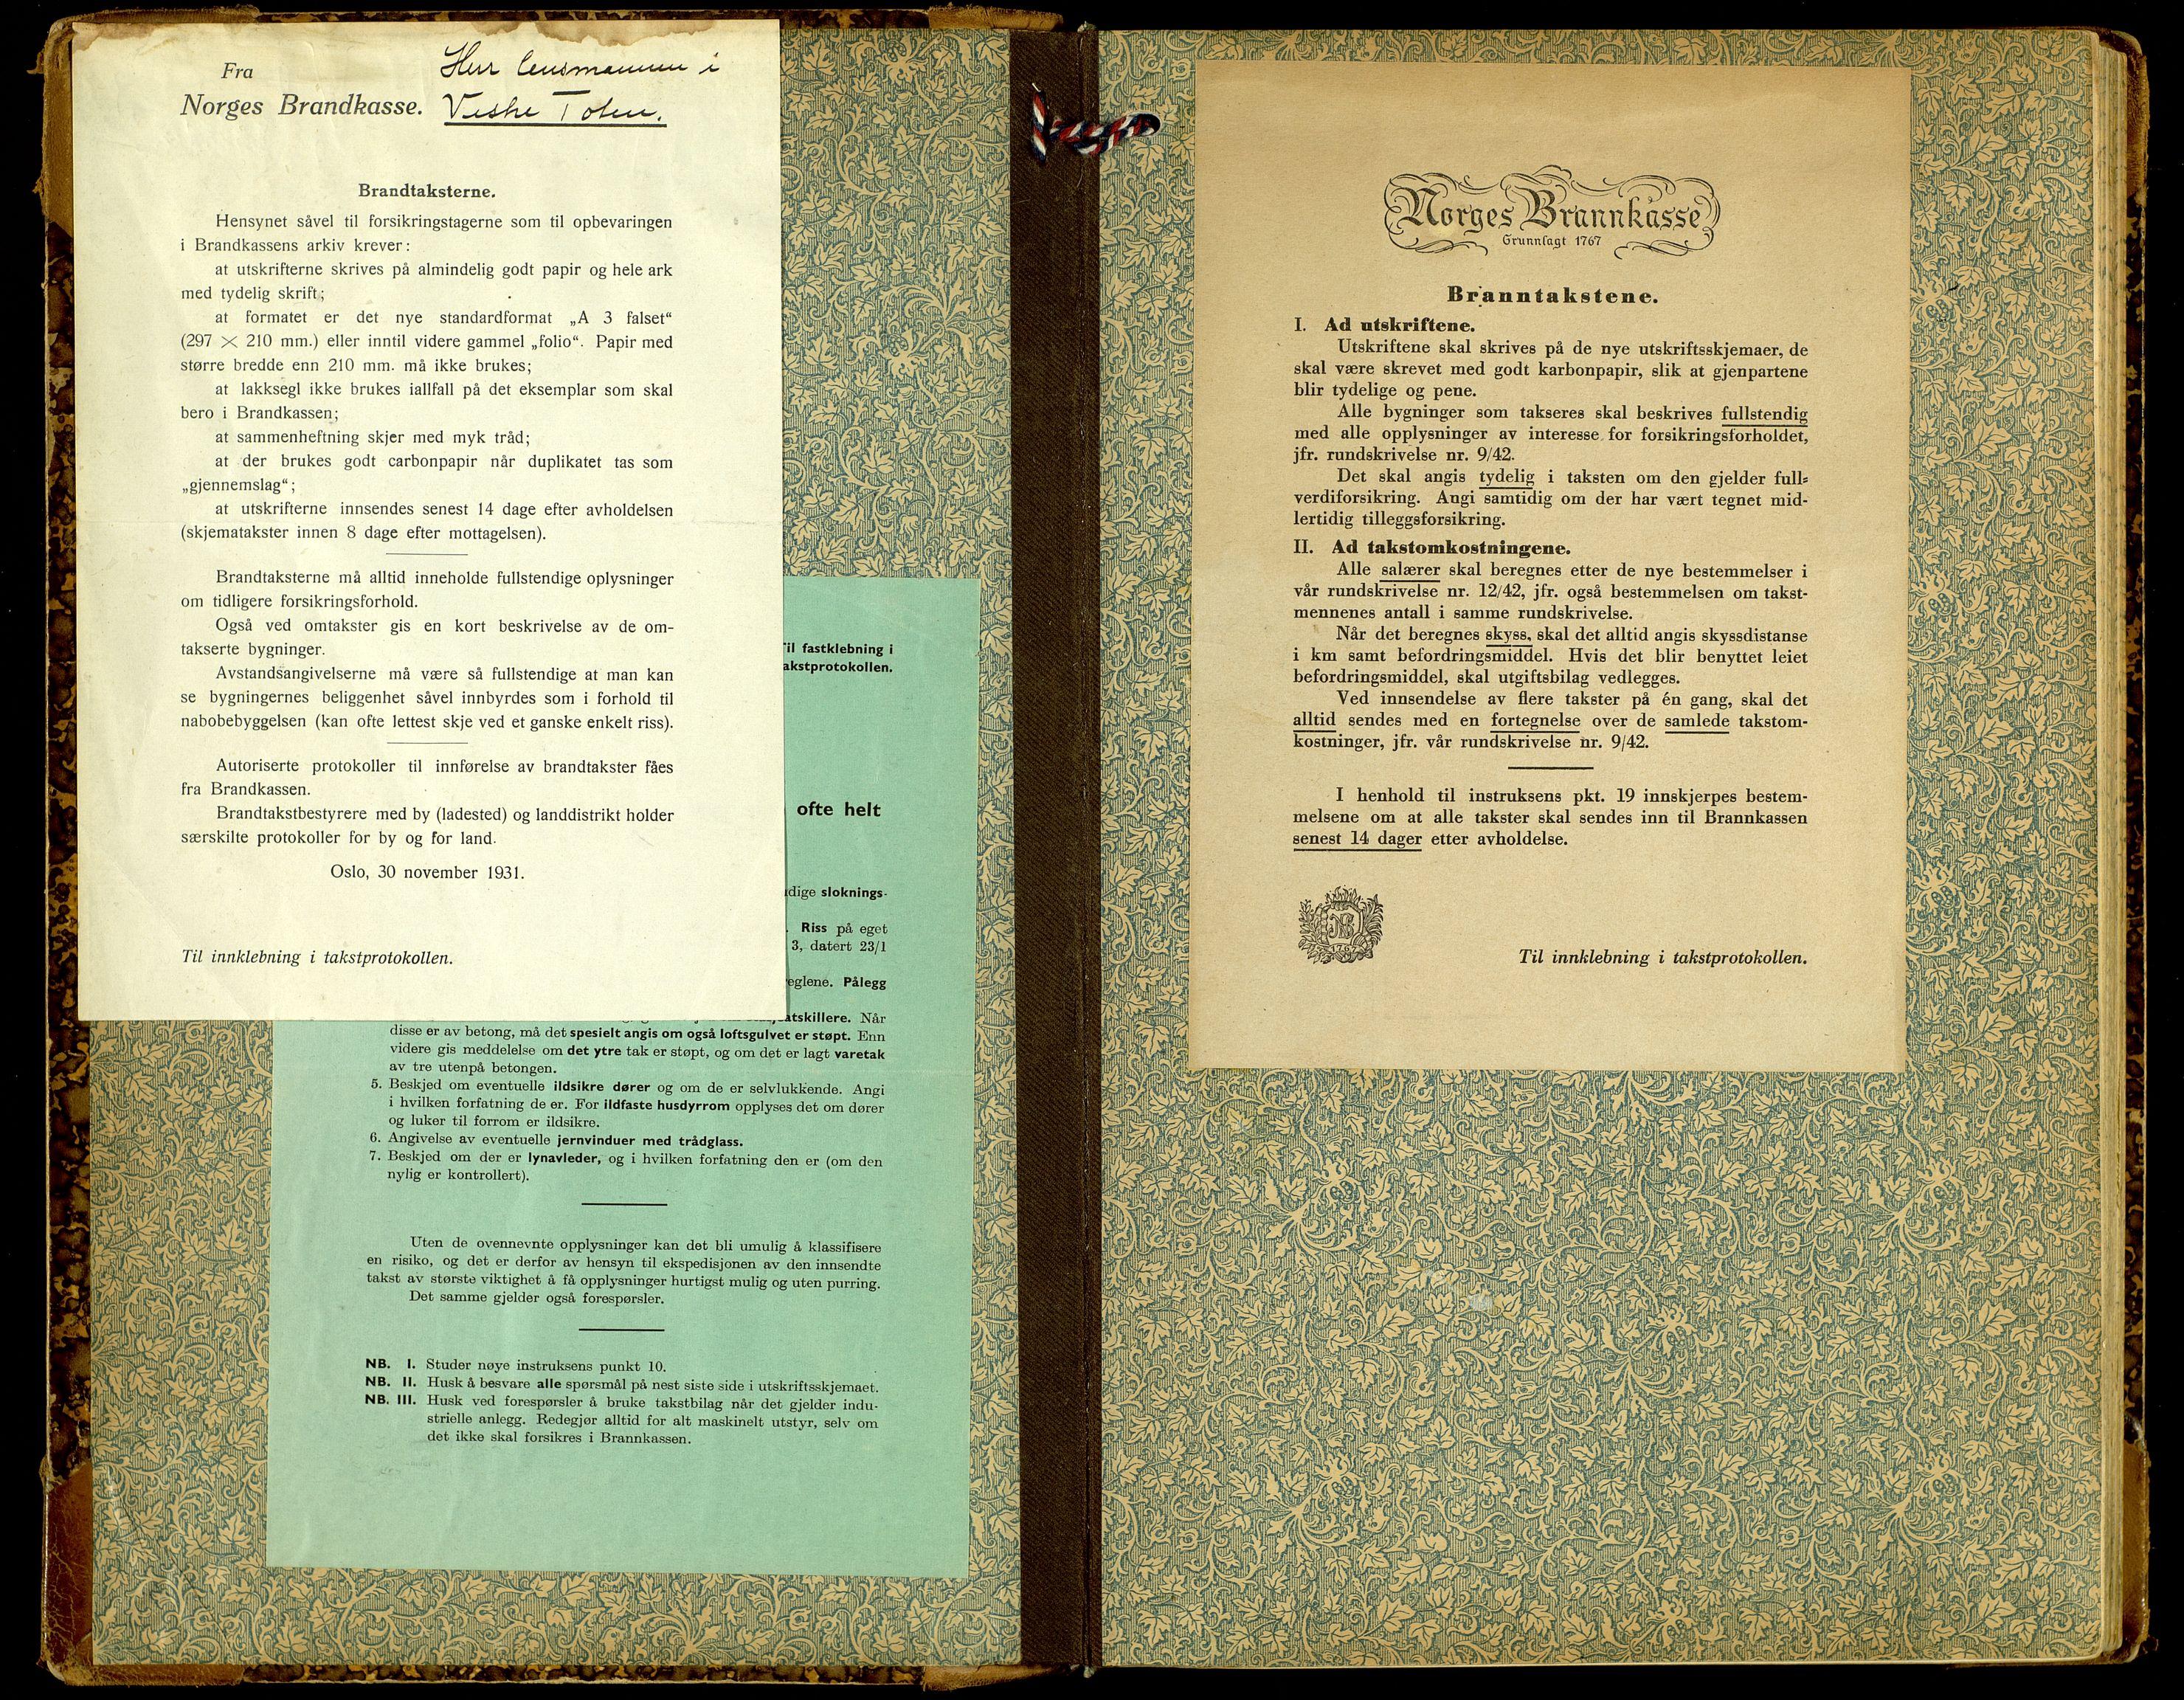 SAH, Norges Brannkasse, Vestre Toten, 1919-1952